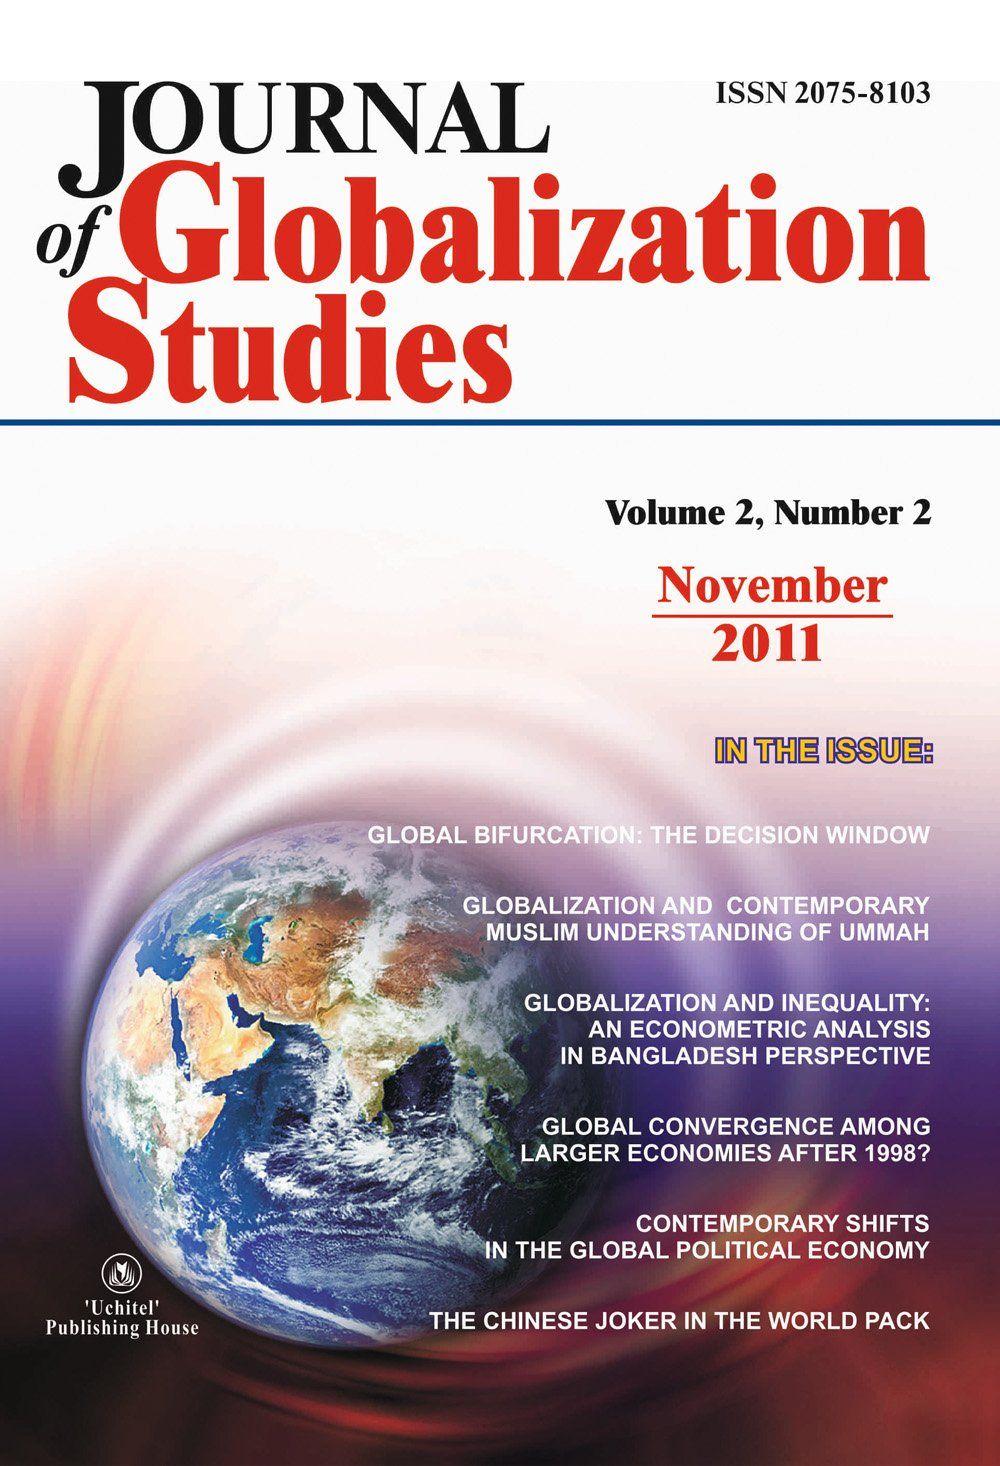 Journal of Globalization Studies Volume 2, Number 2011 г. Журнал глобализационных исследований Международный журнал на английском языке.